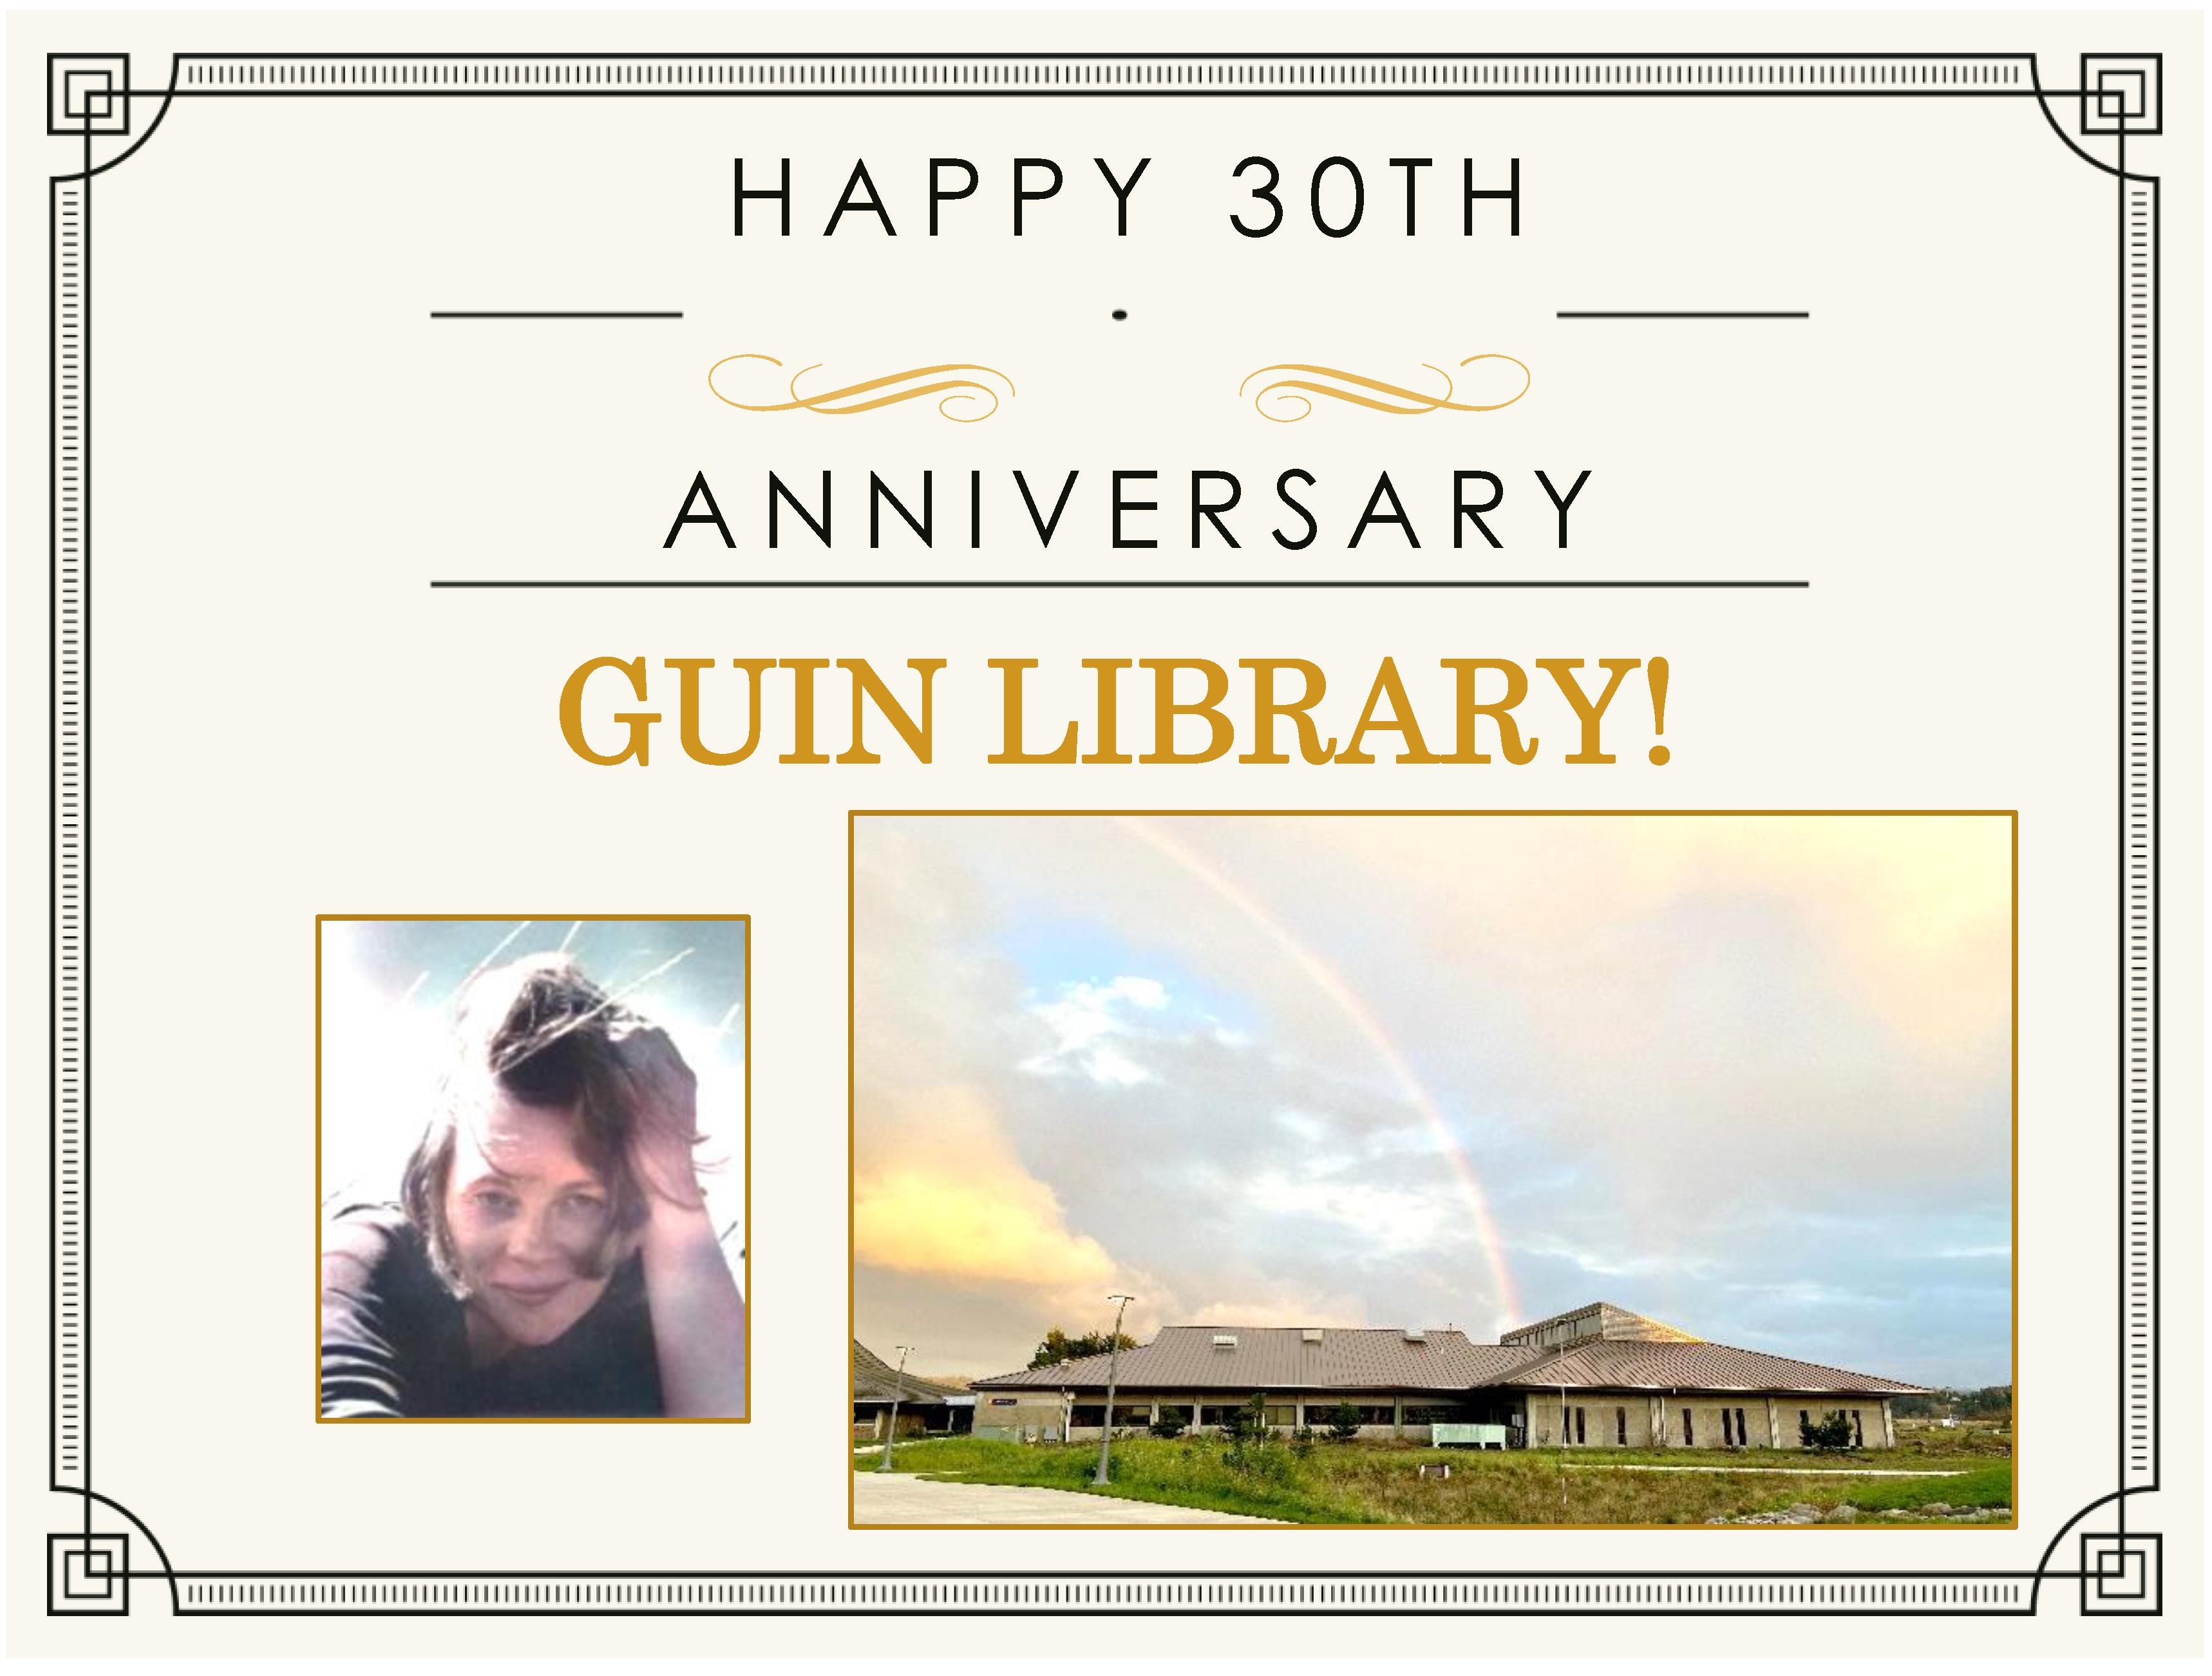 Happy 30th Anniversary Guin Library